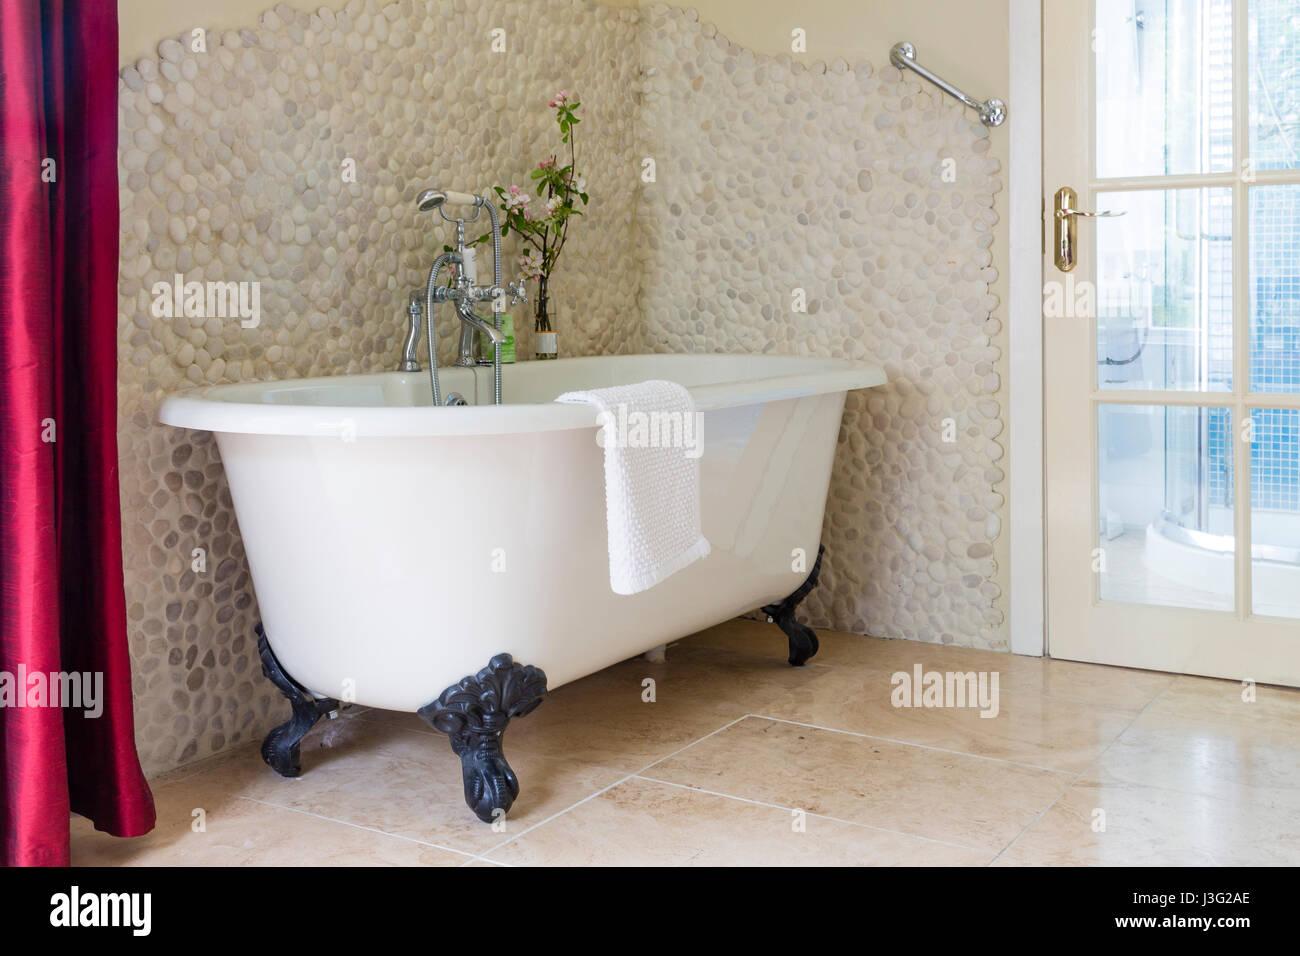 Free standing enamel pedestal bath tub - Stock Image